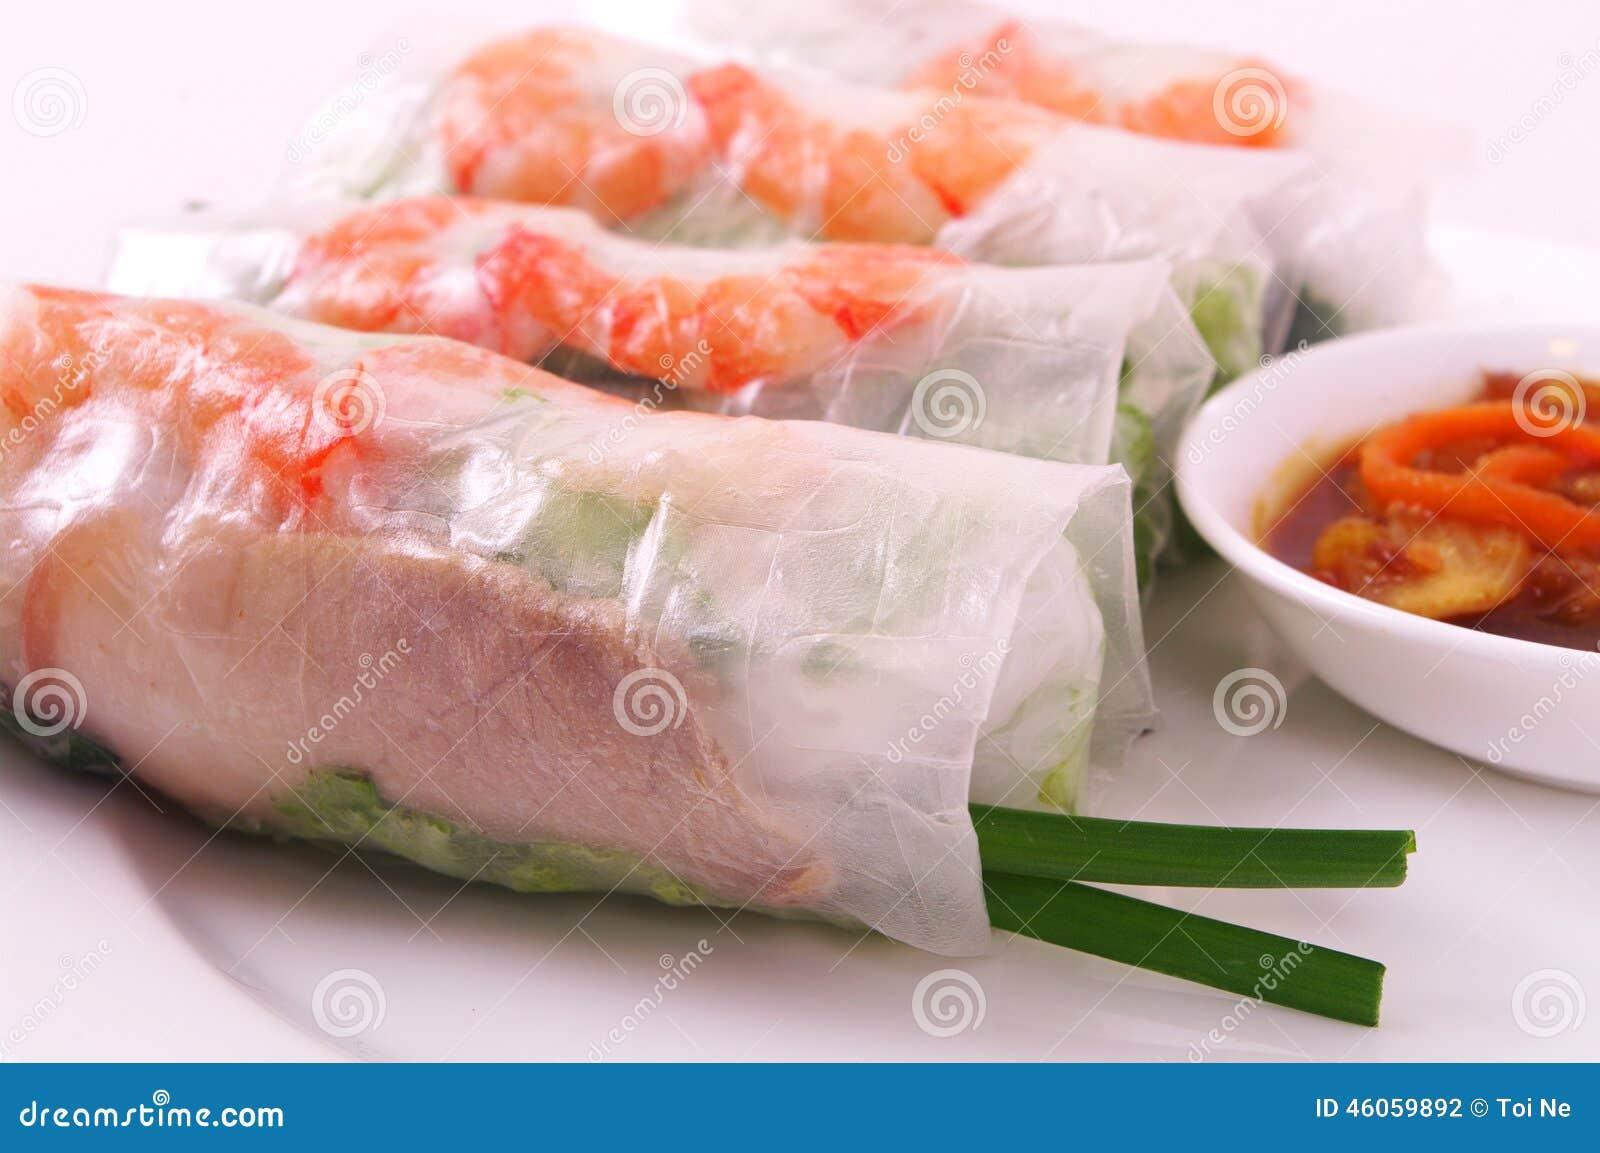 Pork And Shrimp Spring Roll (Goi Cuon), Vietnamese Cuisine ...